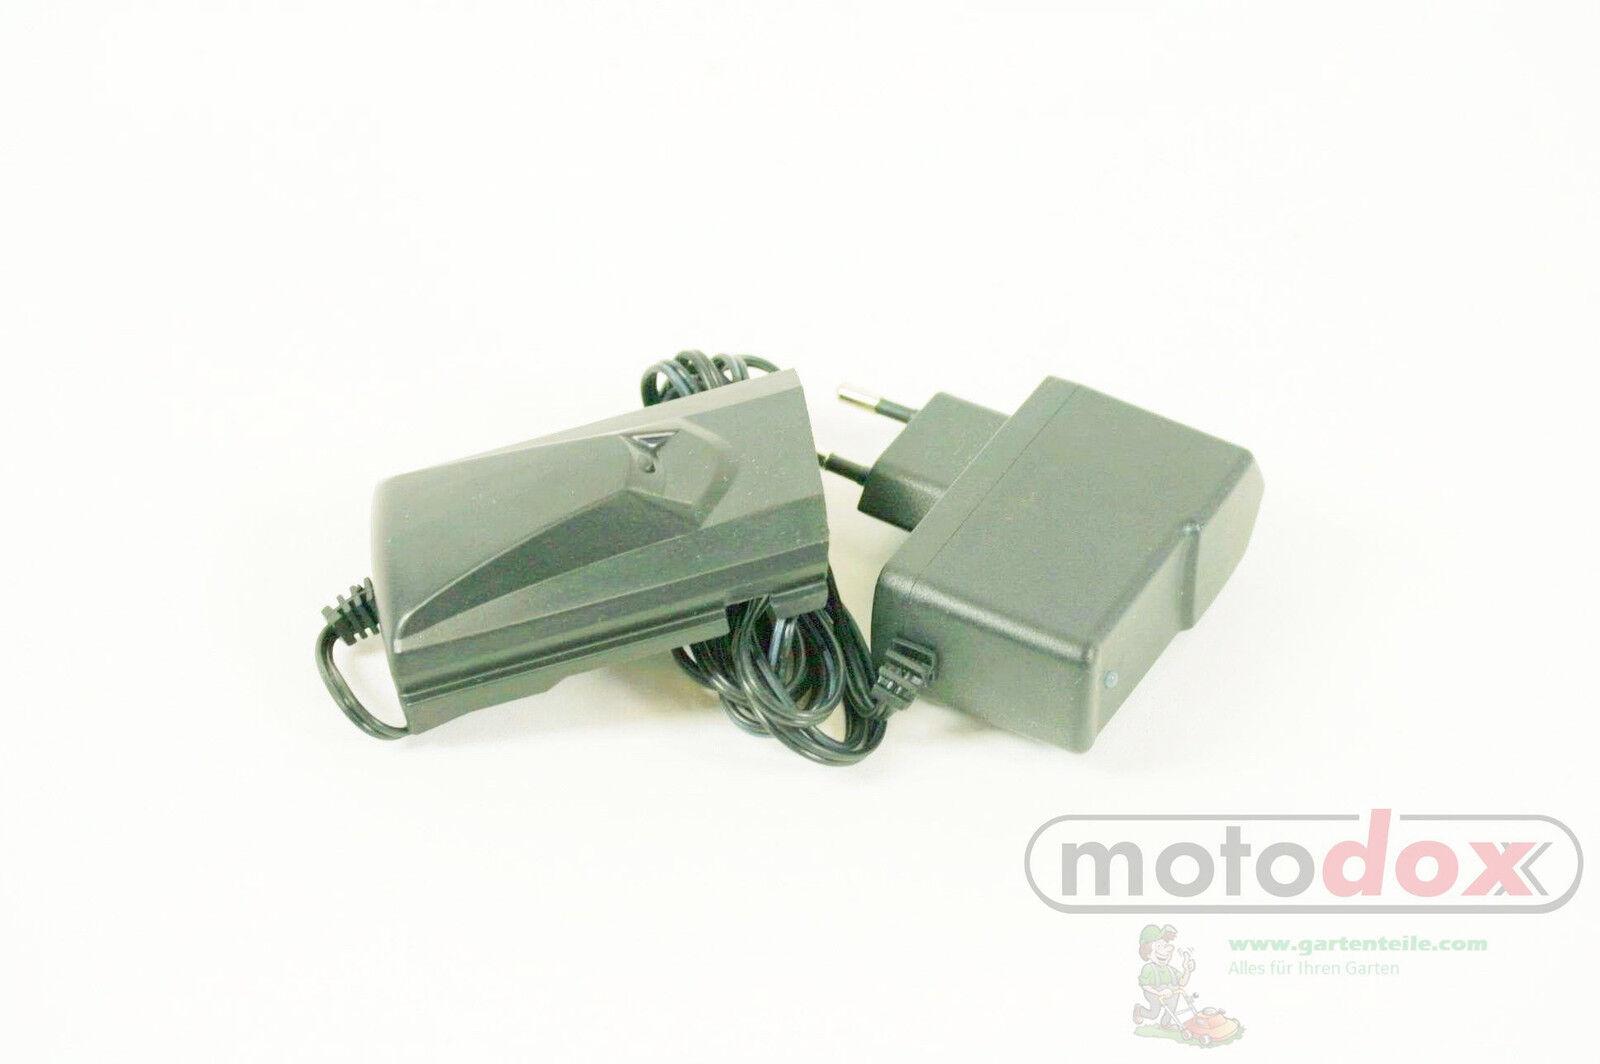 Tubo ugello getto piatto parkside idropulitrice phd 150 a1 for Parkside pistola sparapunti elettrica